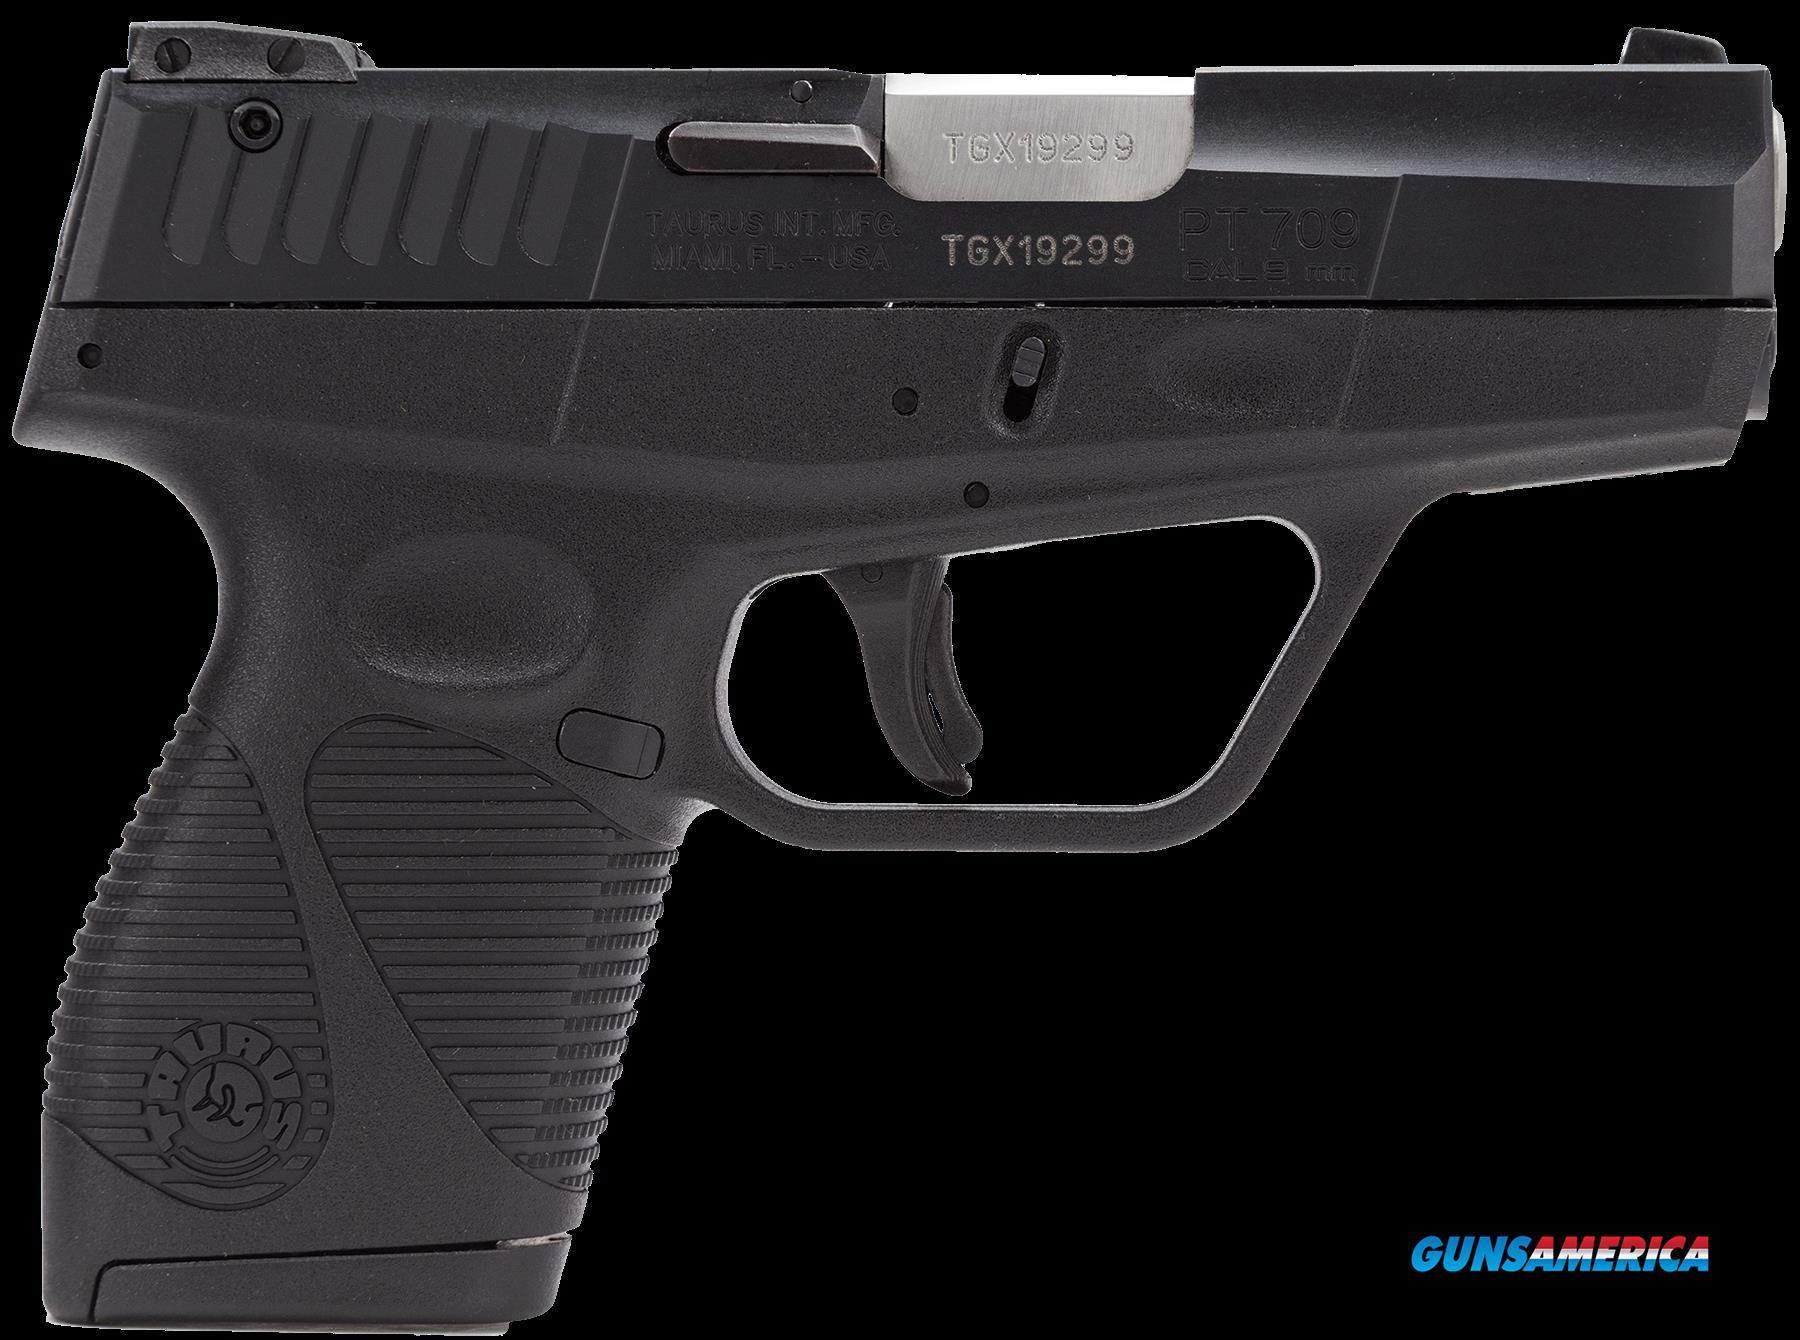 709 slim 9mm pistol - Taurus 1709031fs 709 Slim Sa Da 9mm 3 6 1 Black Poly Grip